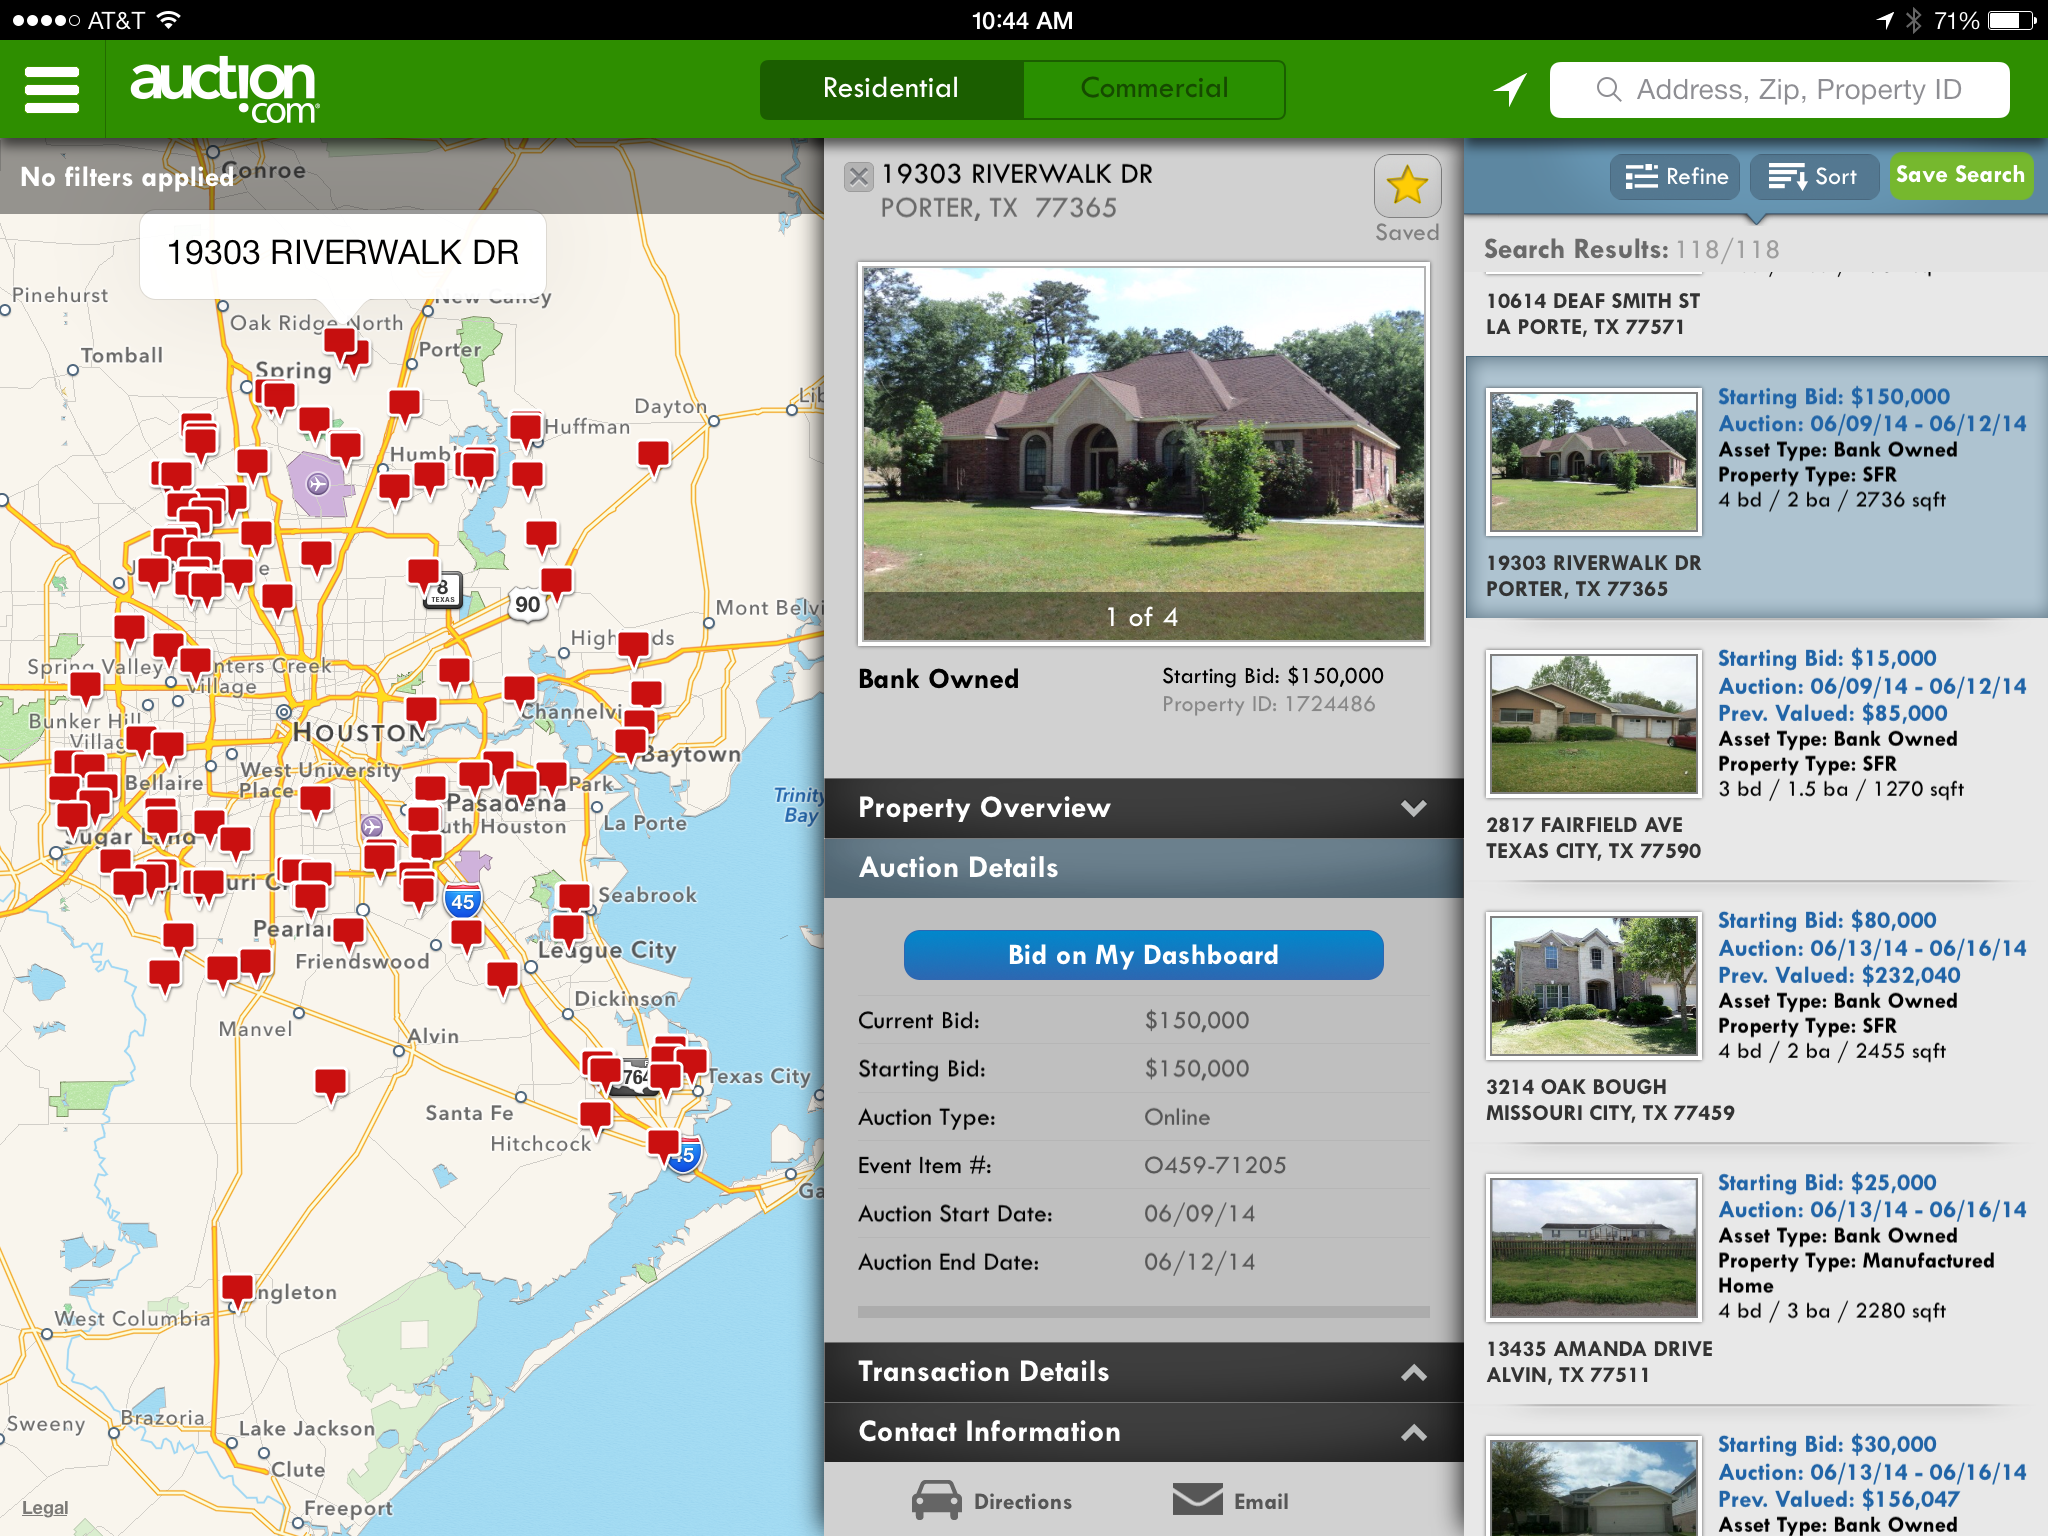 Auction.com iPad App - Property Page 1